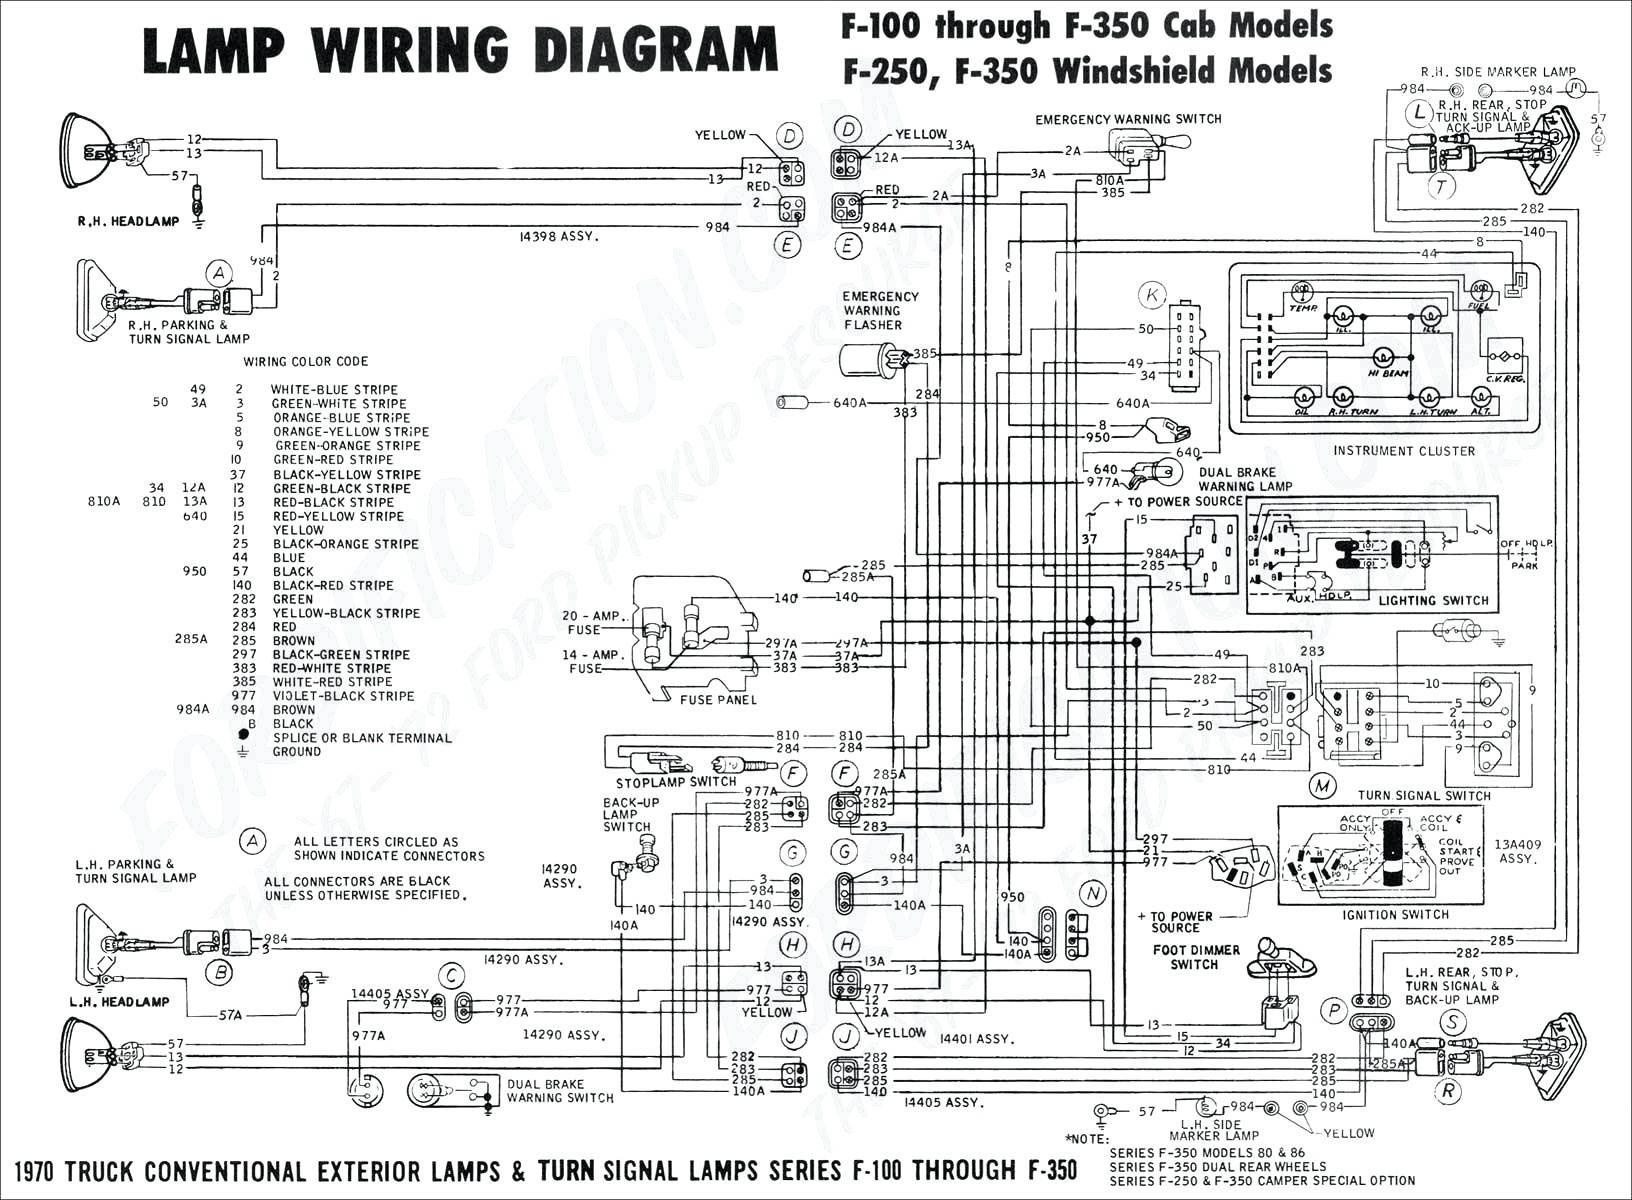 Small Engine Repair Diagrams Semi Trailer Wiring Diagram Image Of Small Engine Repair Diagrams Switch Wiring Diagram Collection